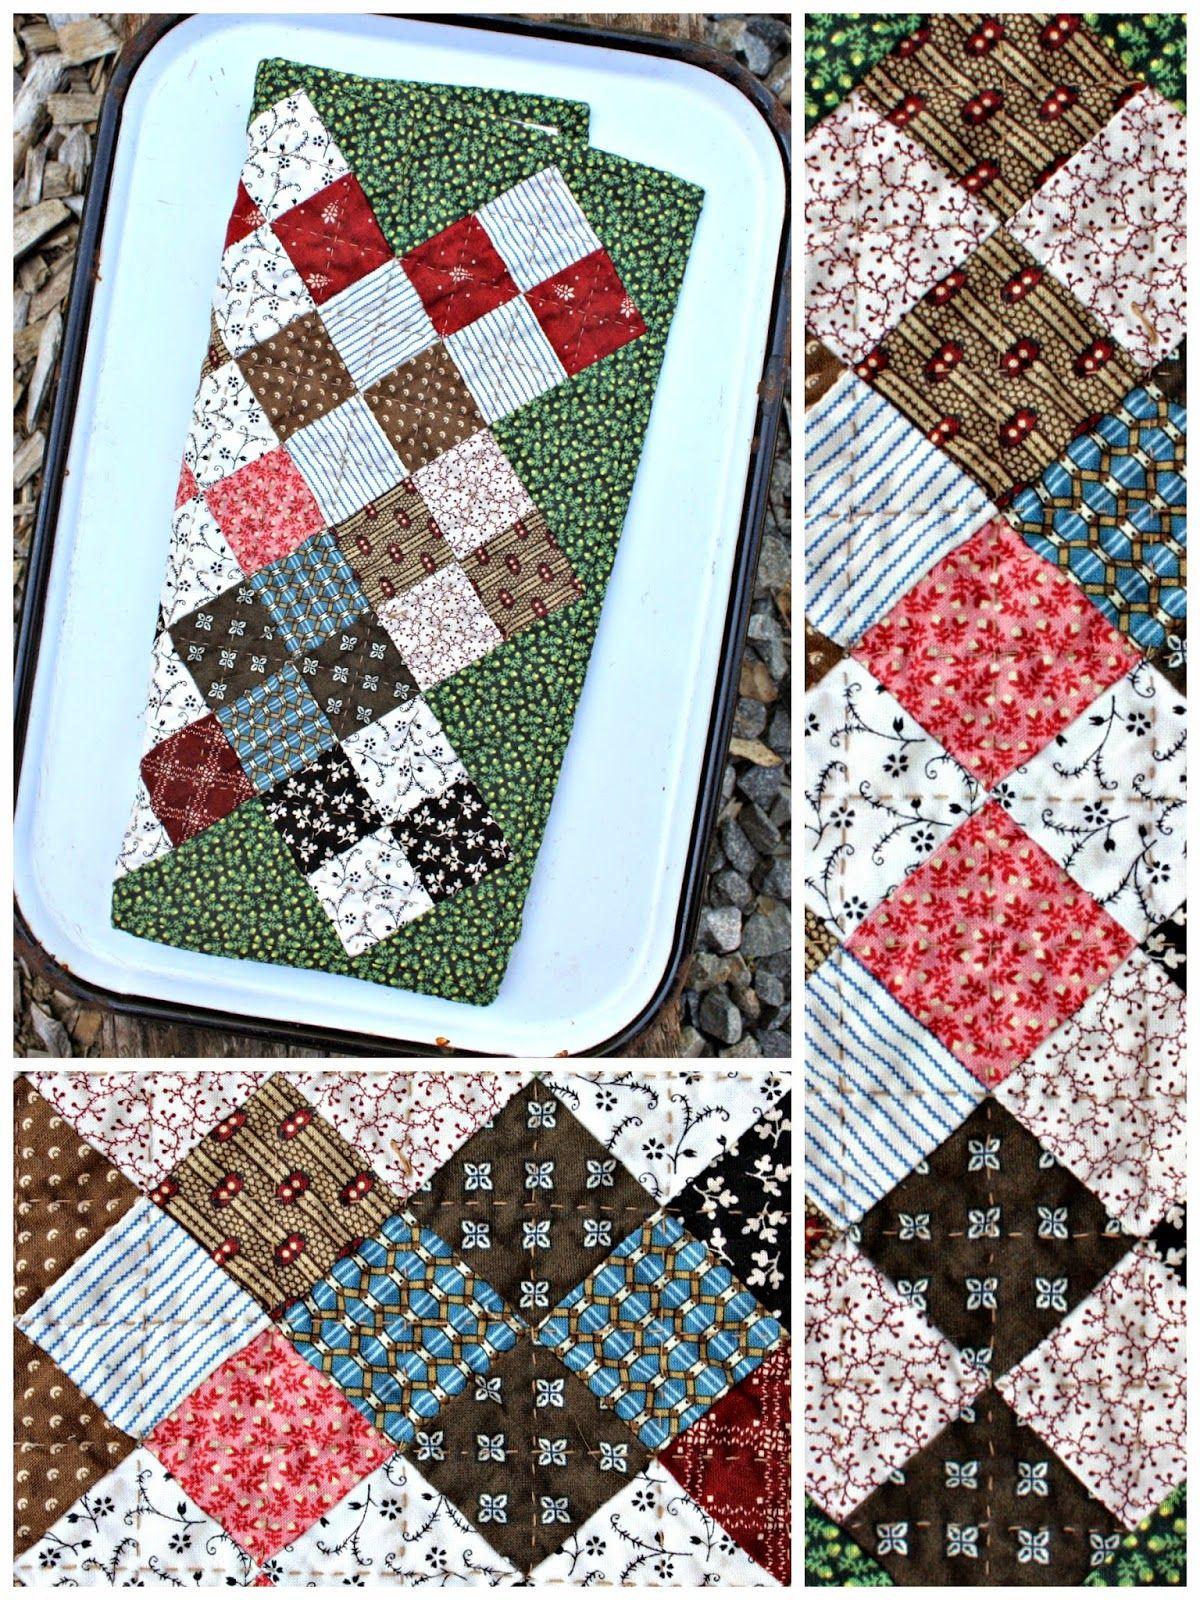 Postcard Patterns - Temecula Quilt Co   QUILTS   Pinterest ... : temecula quilt company - Adamdwight.com